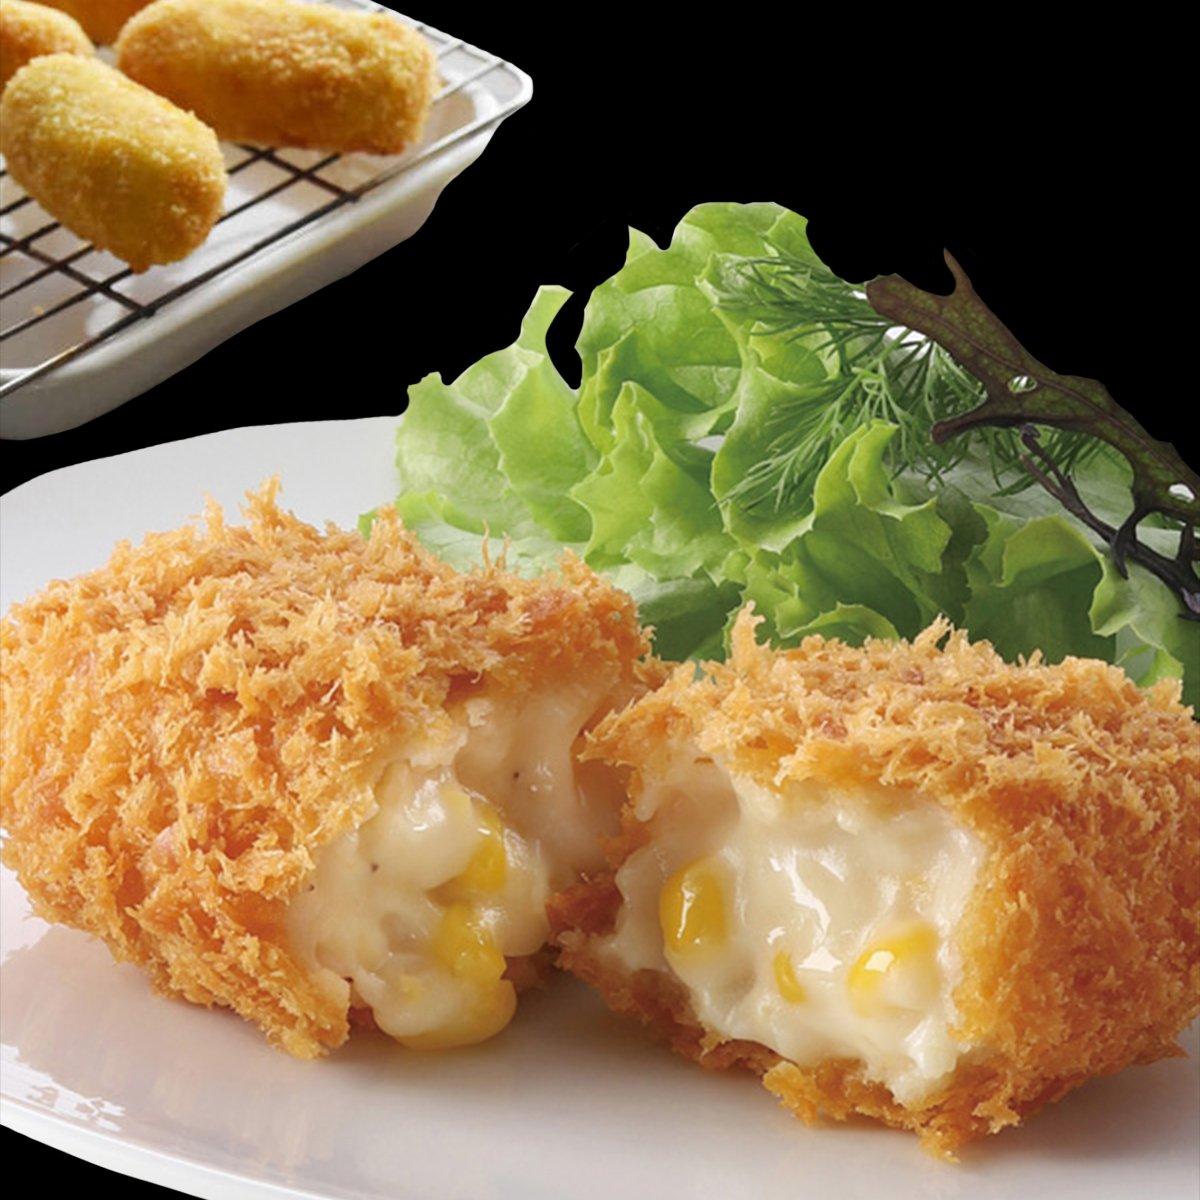 Silky Cream Corn Croquette from Shizuoka (8pcs) / コーンクリームコロッケ 75g 8pcs